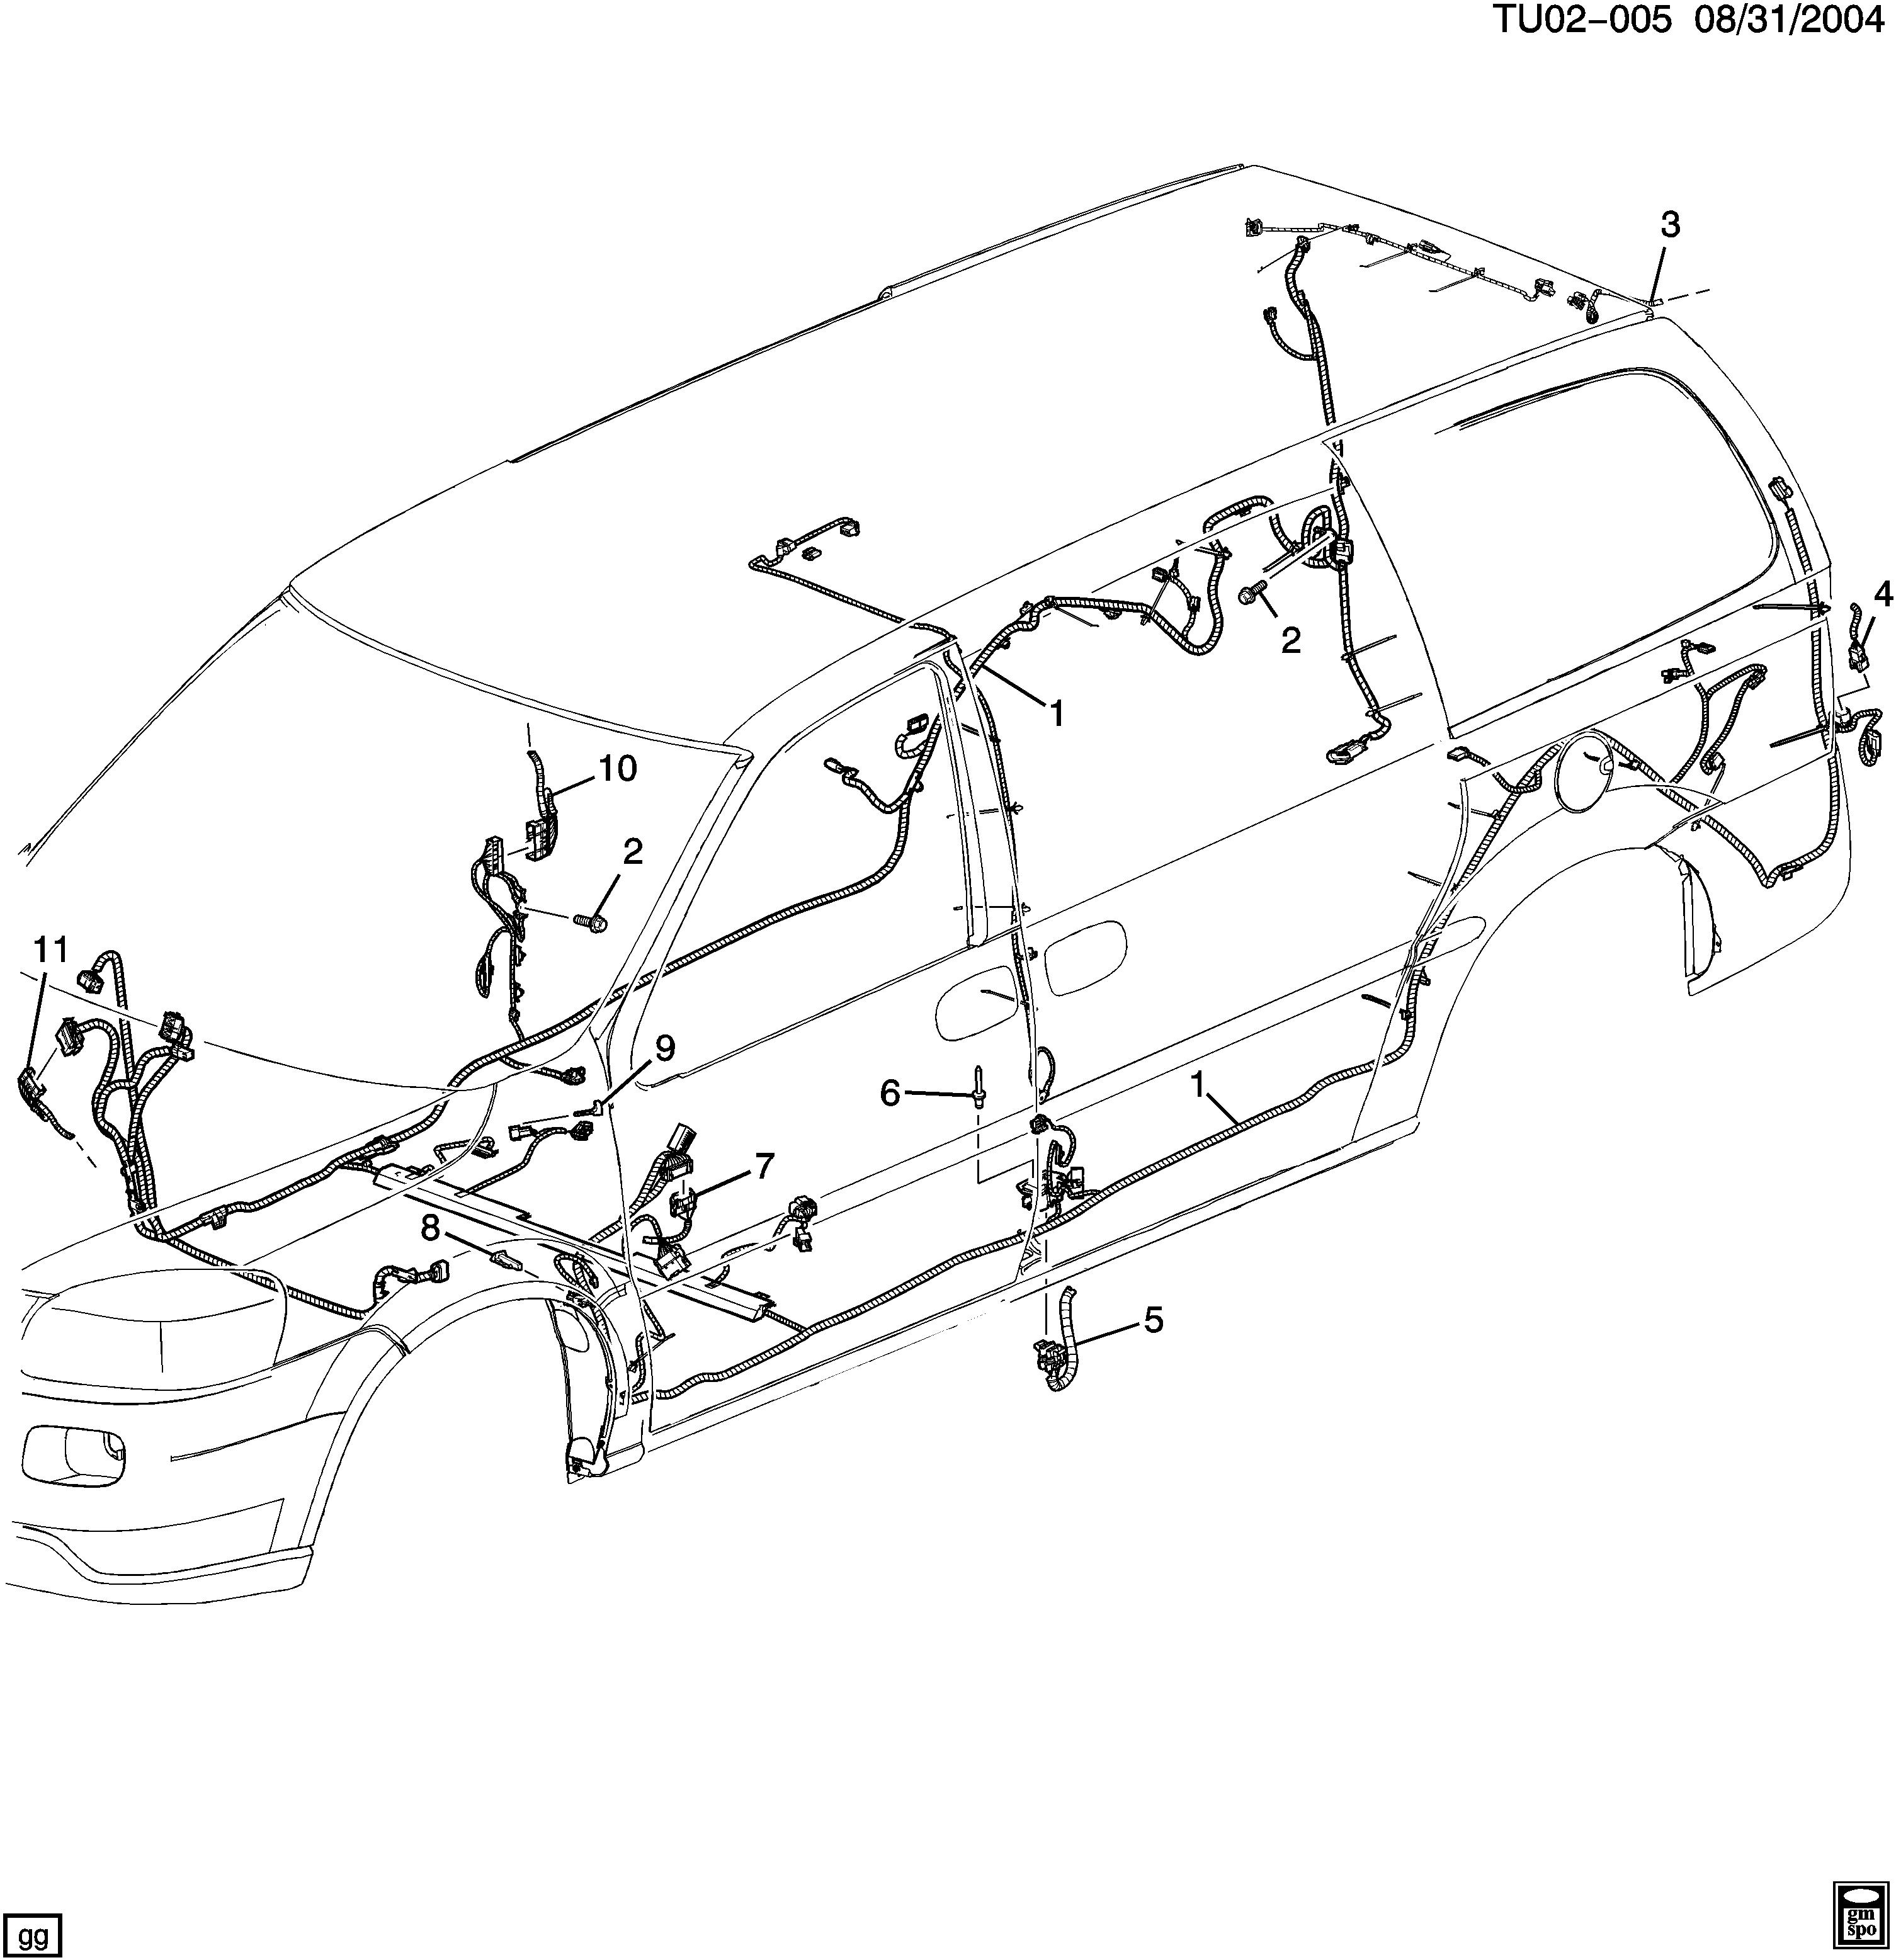 Pontiac Montana SV6 - Ext wheelbase (2WD) - UX1 WIRING HARNESS/BODY > EPC  Online > Nemiga.com